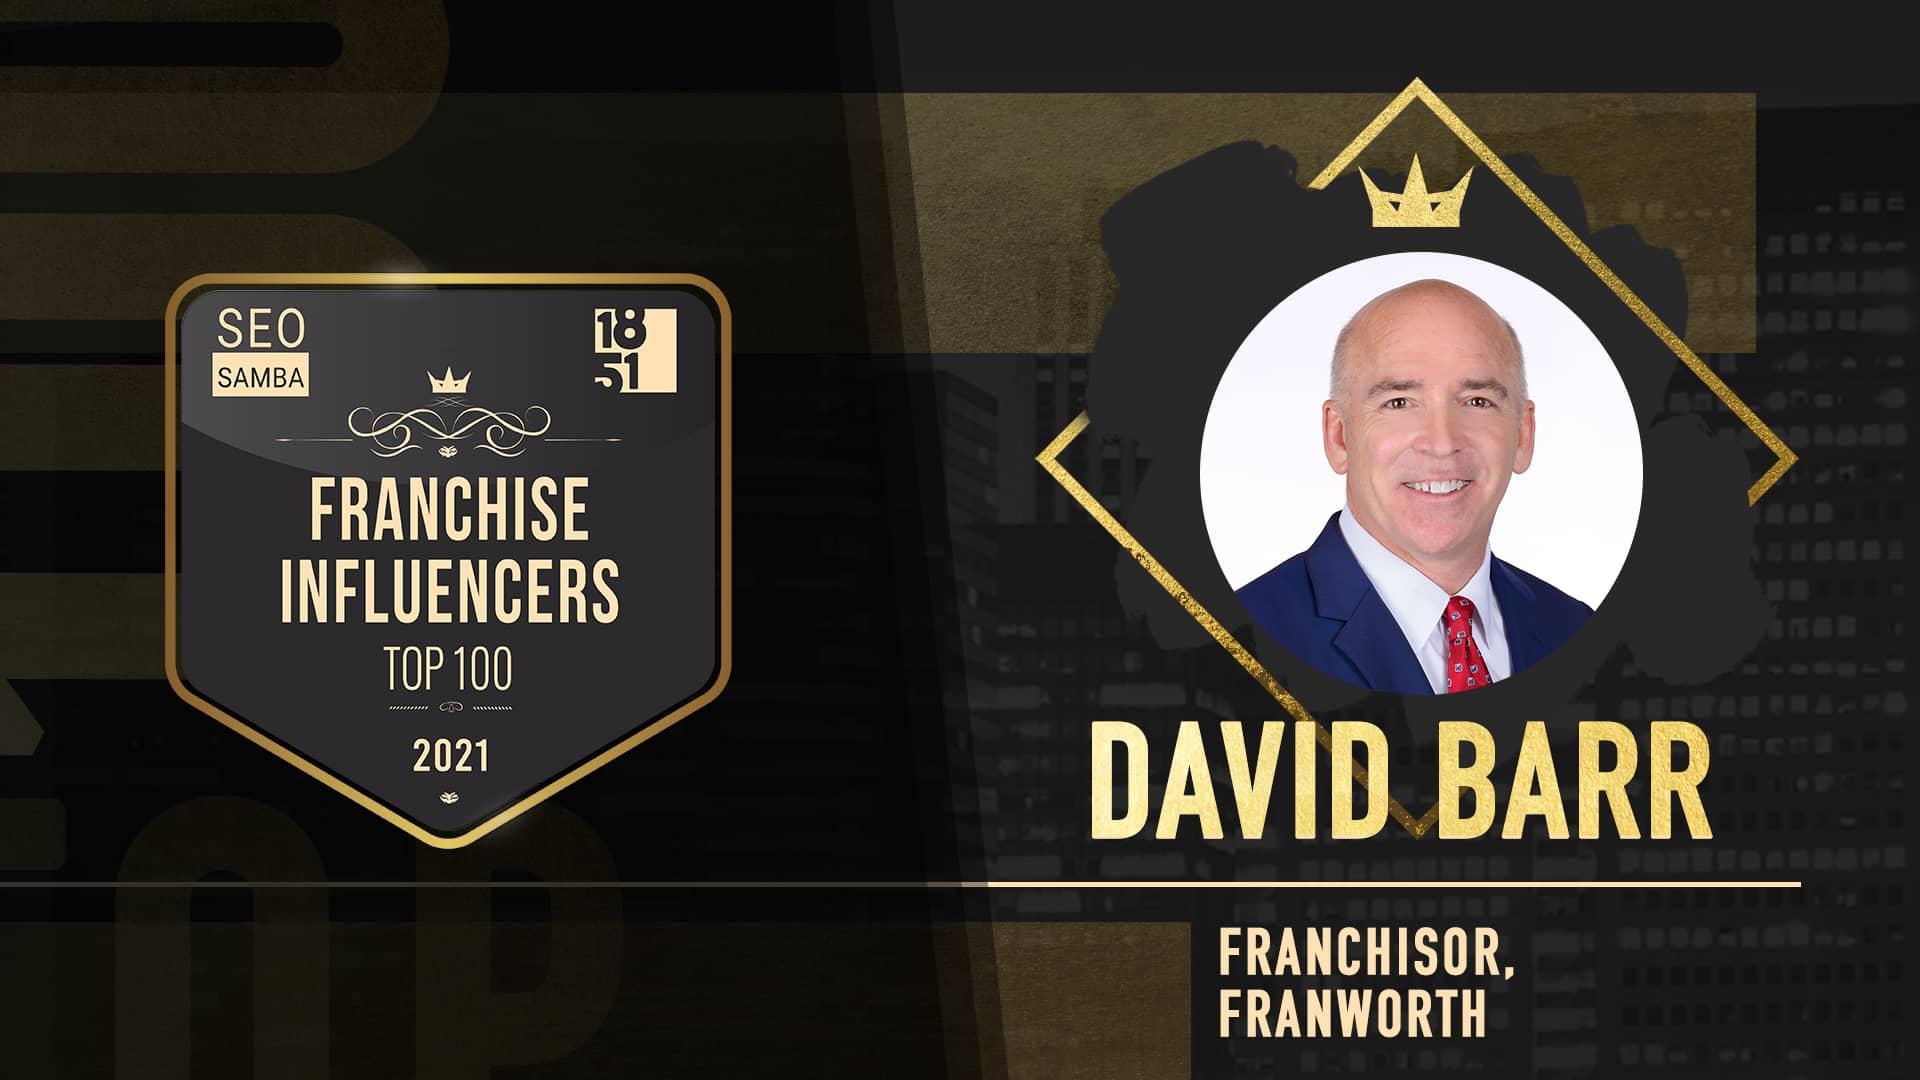 David Barr - FranWorth